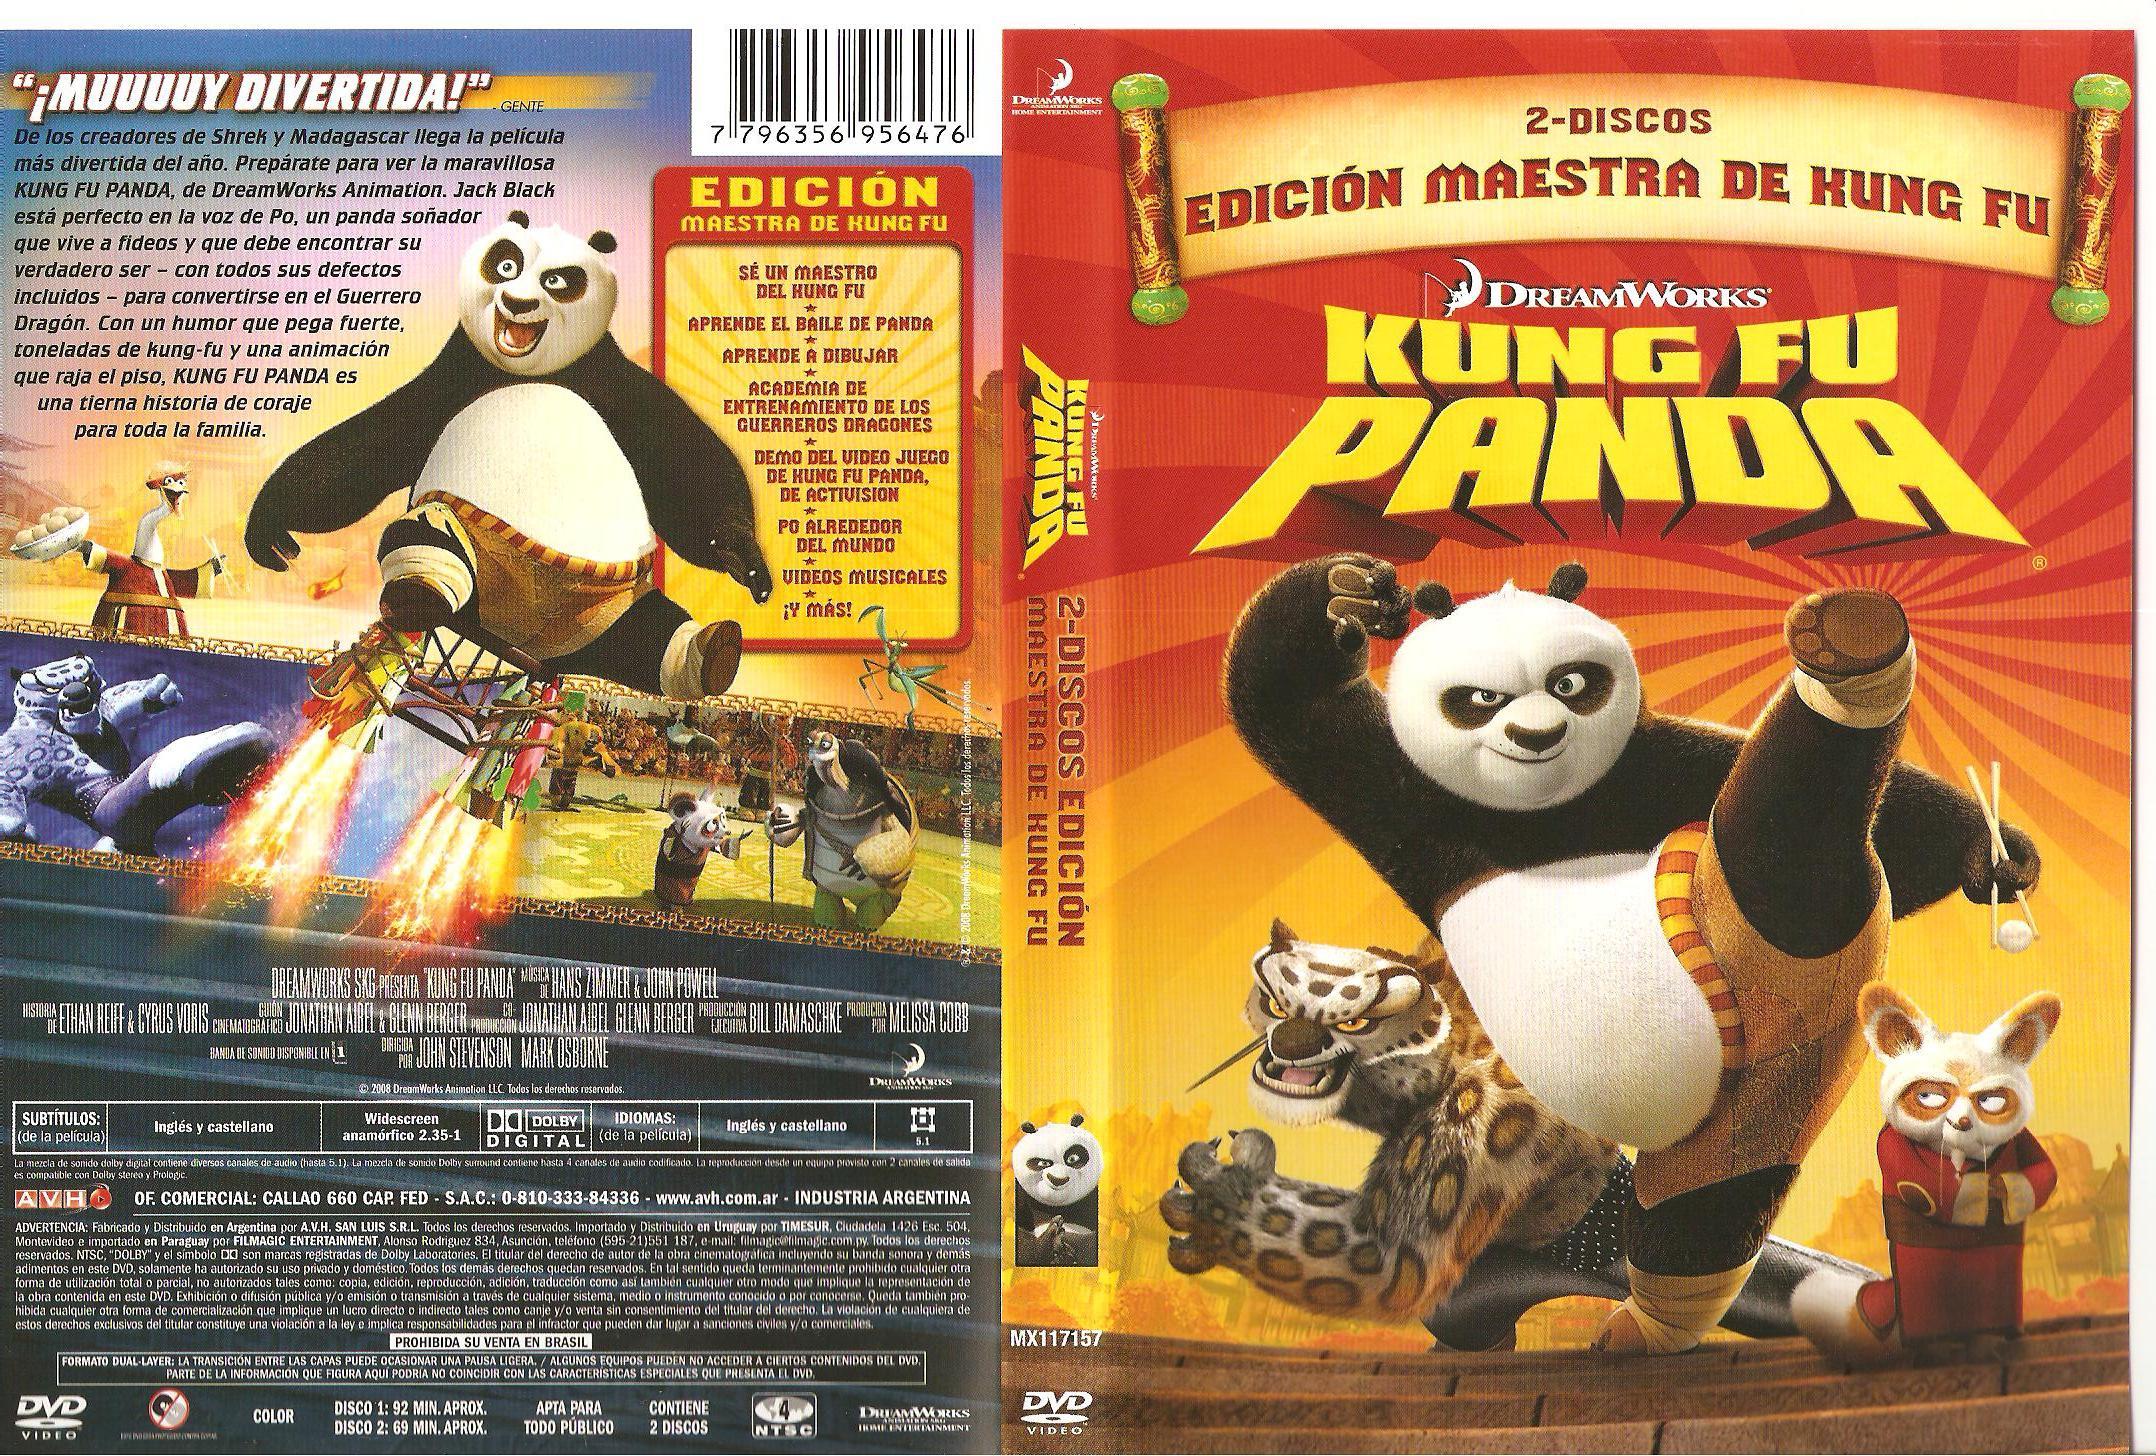 Kung Fu Panda 2 Dvd Cover Kung Fu Panda Dvd Cove...